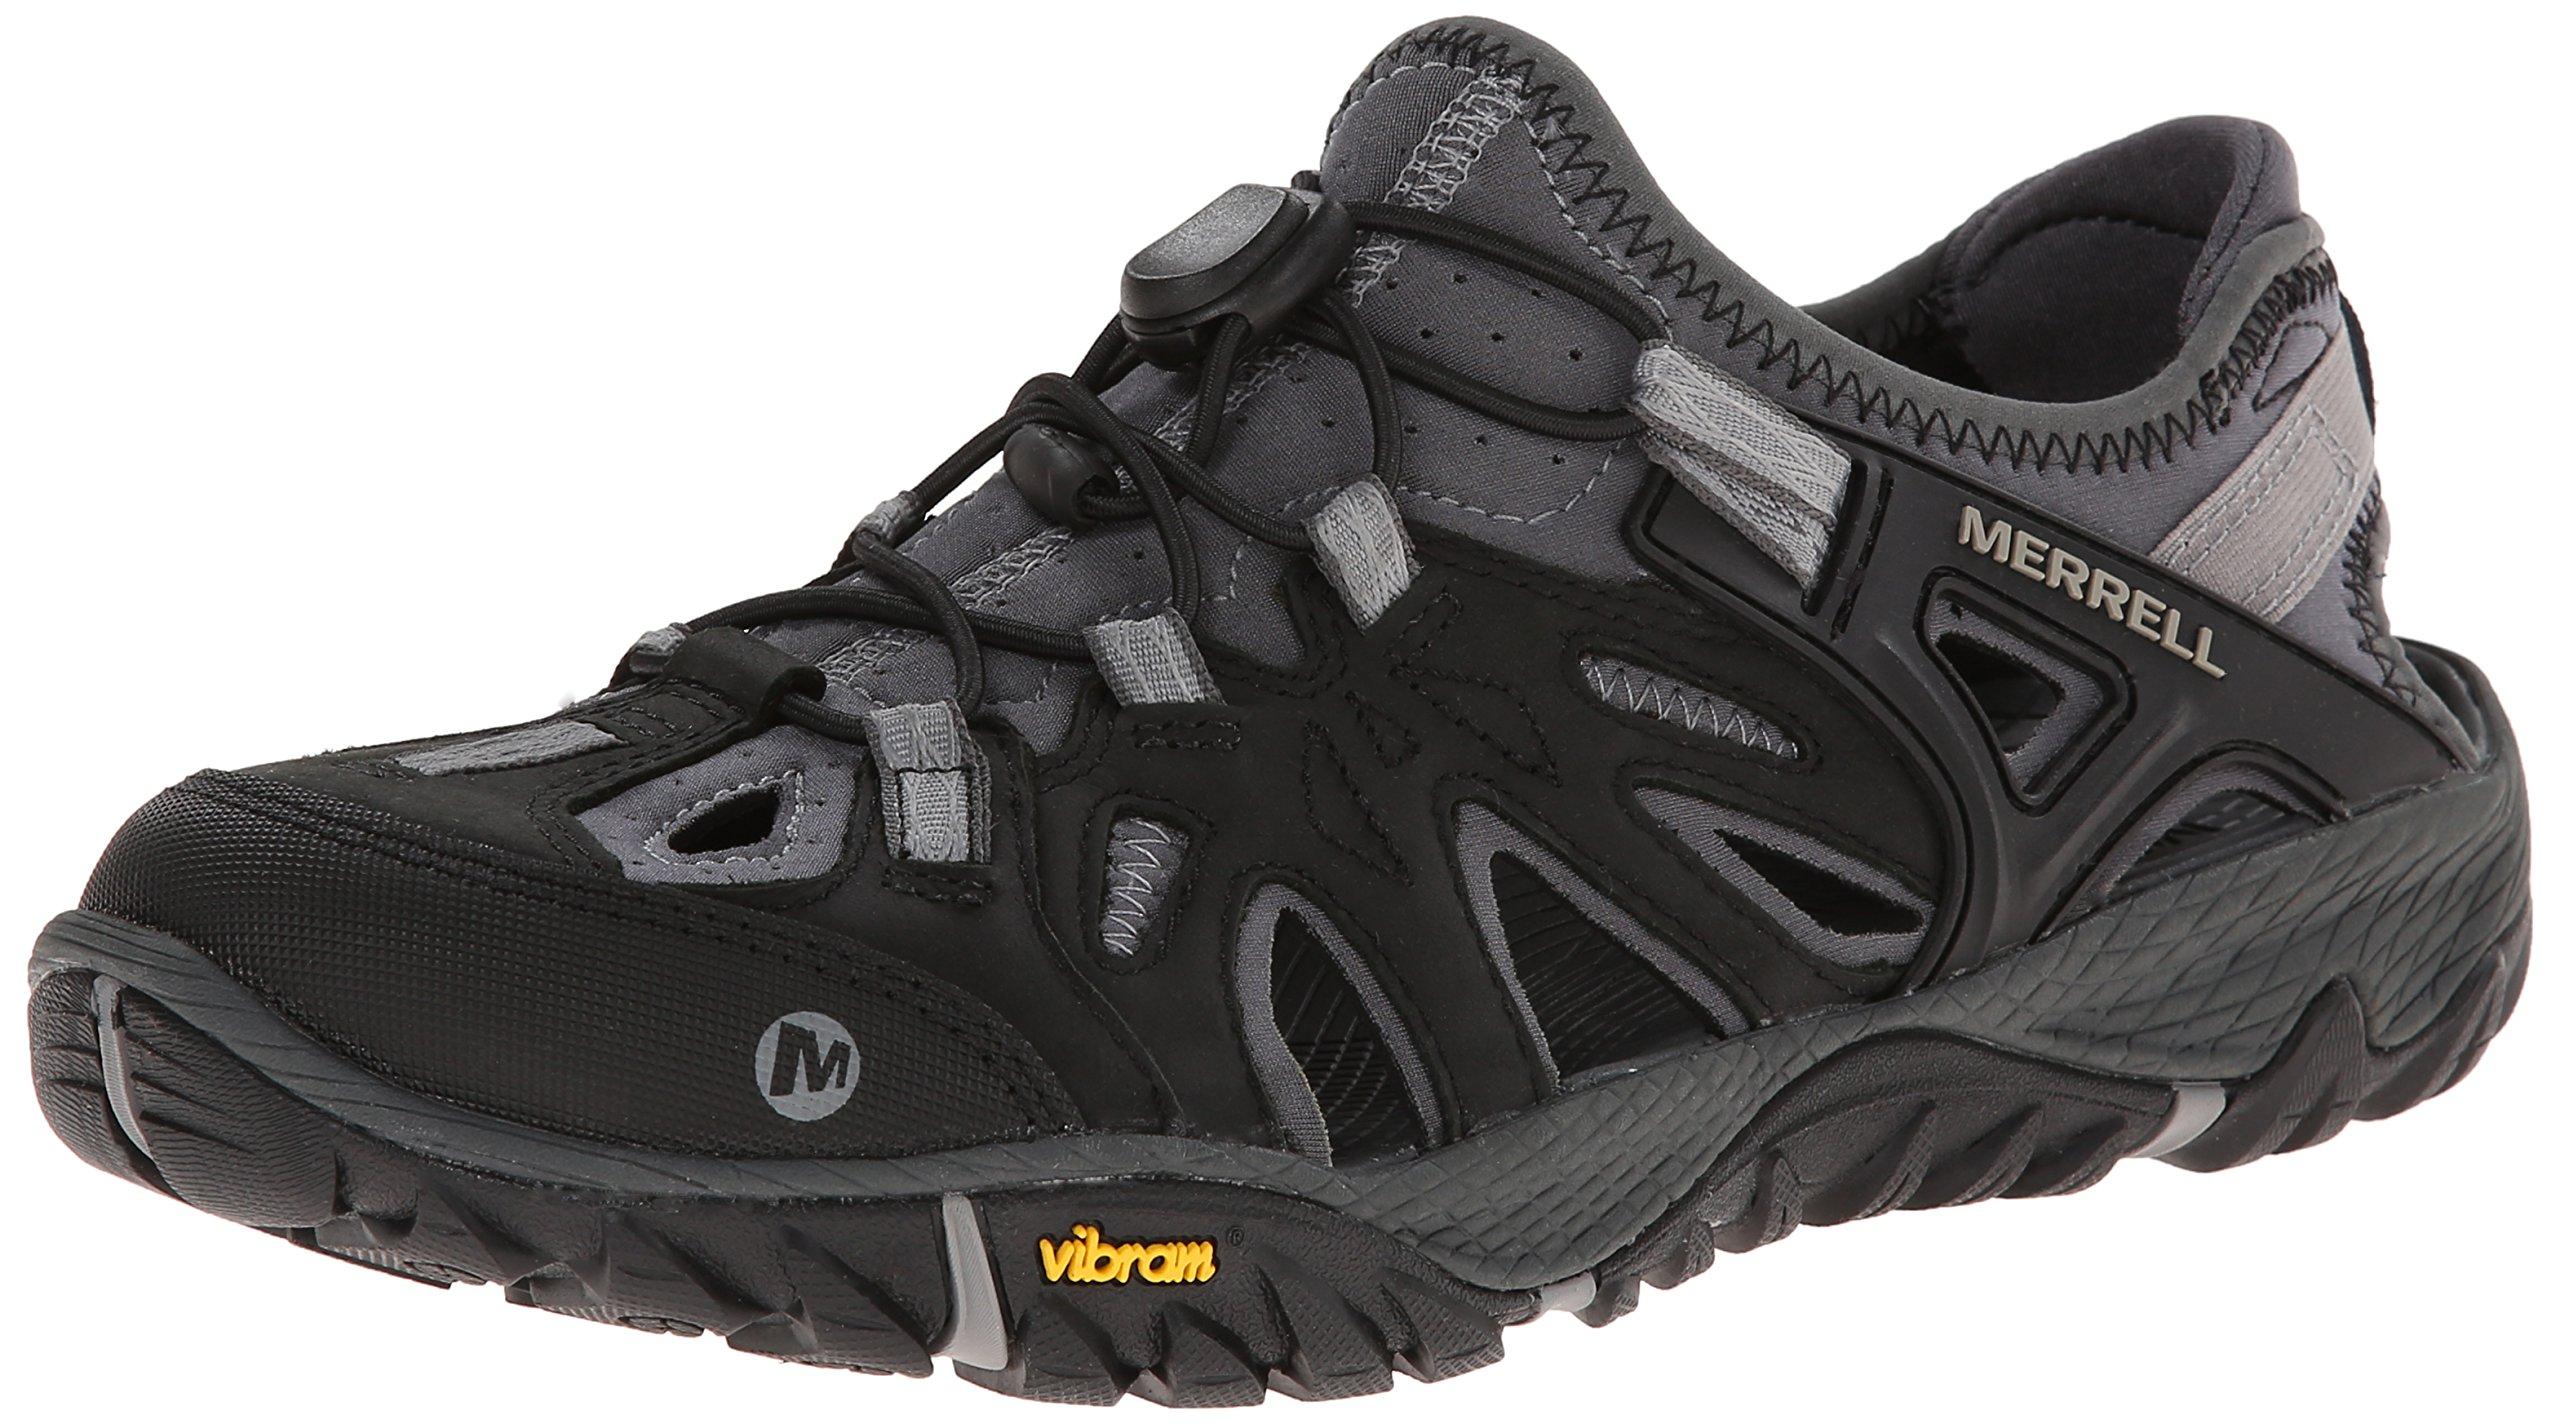 Merrell Men's All Out Blaze Sieve Water Shoe, Black/Wild Dove, 11 M US